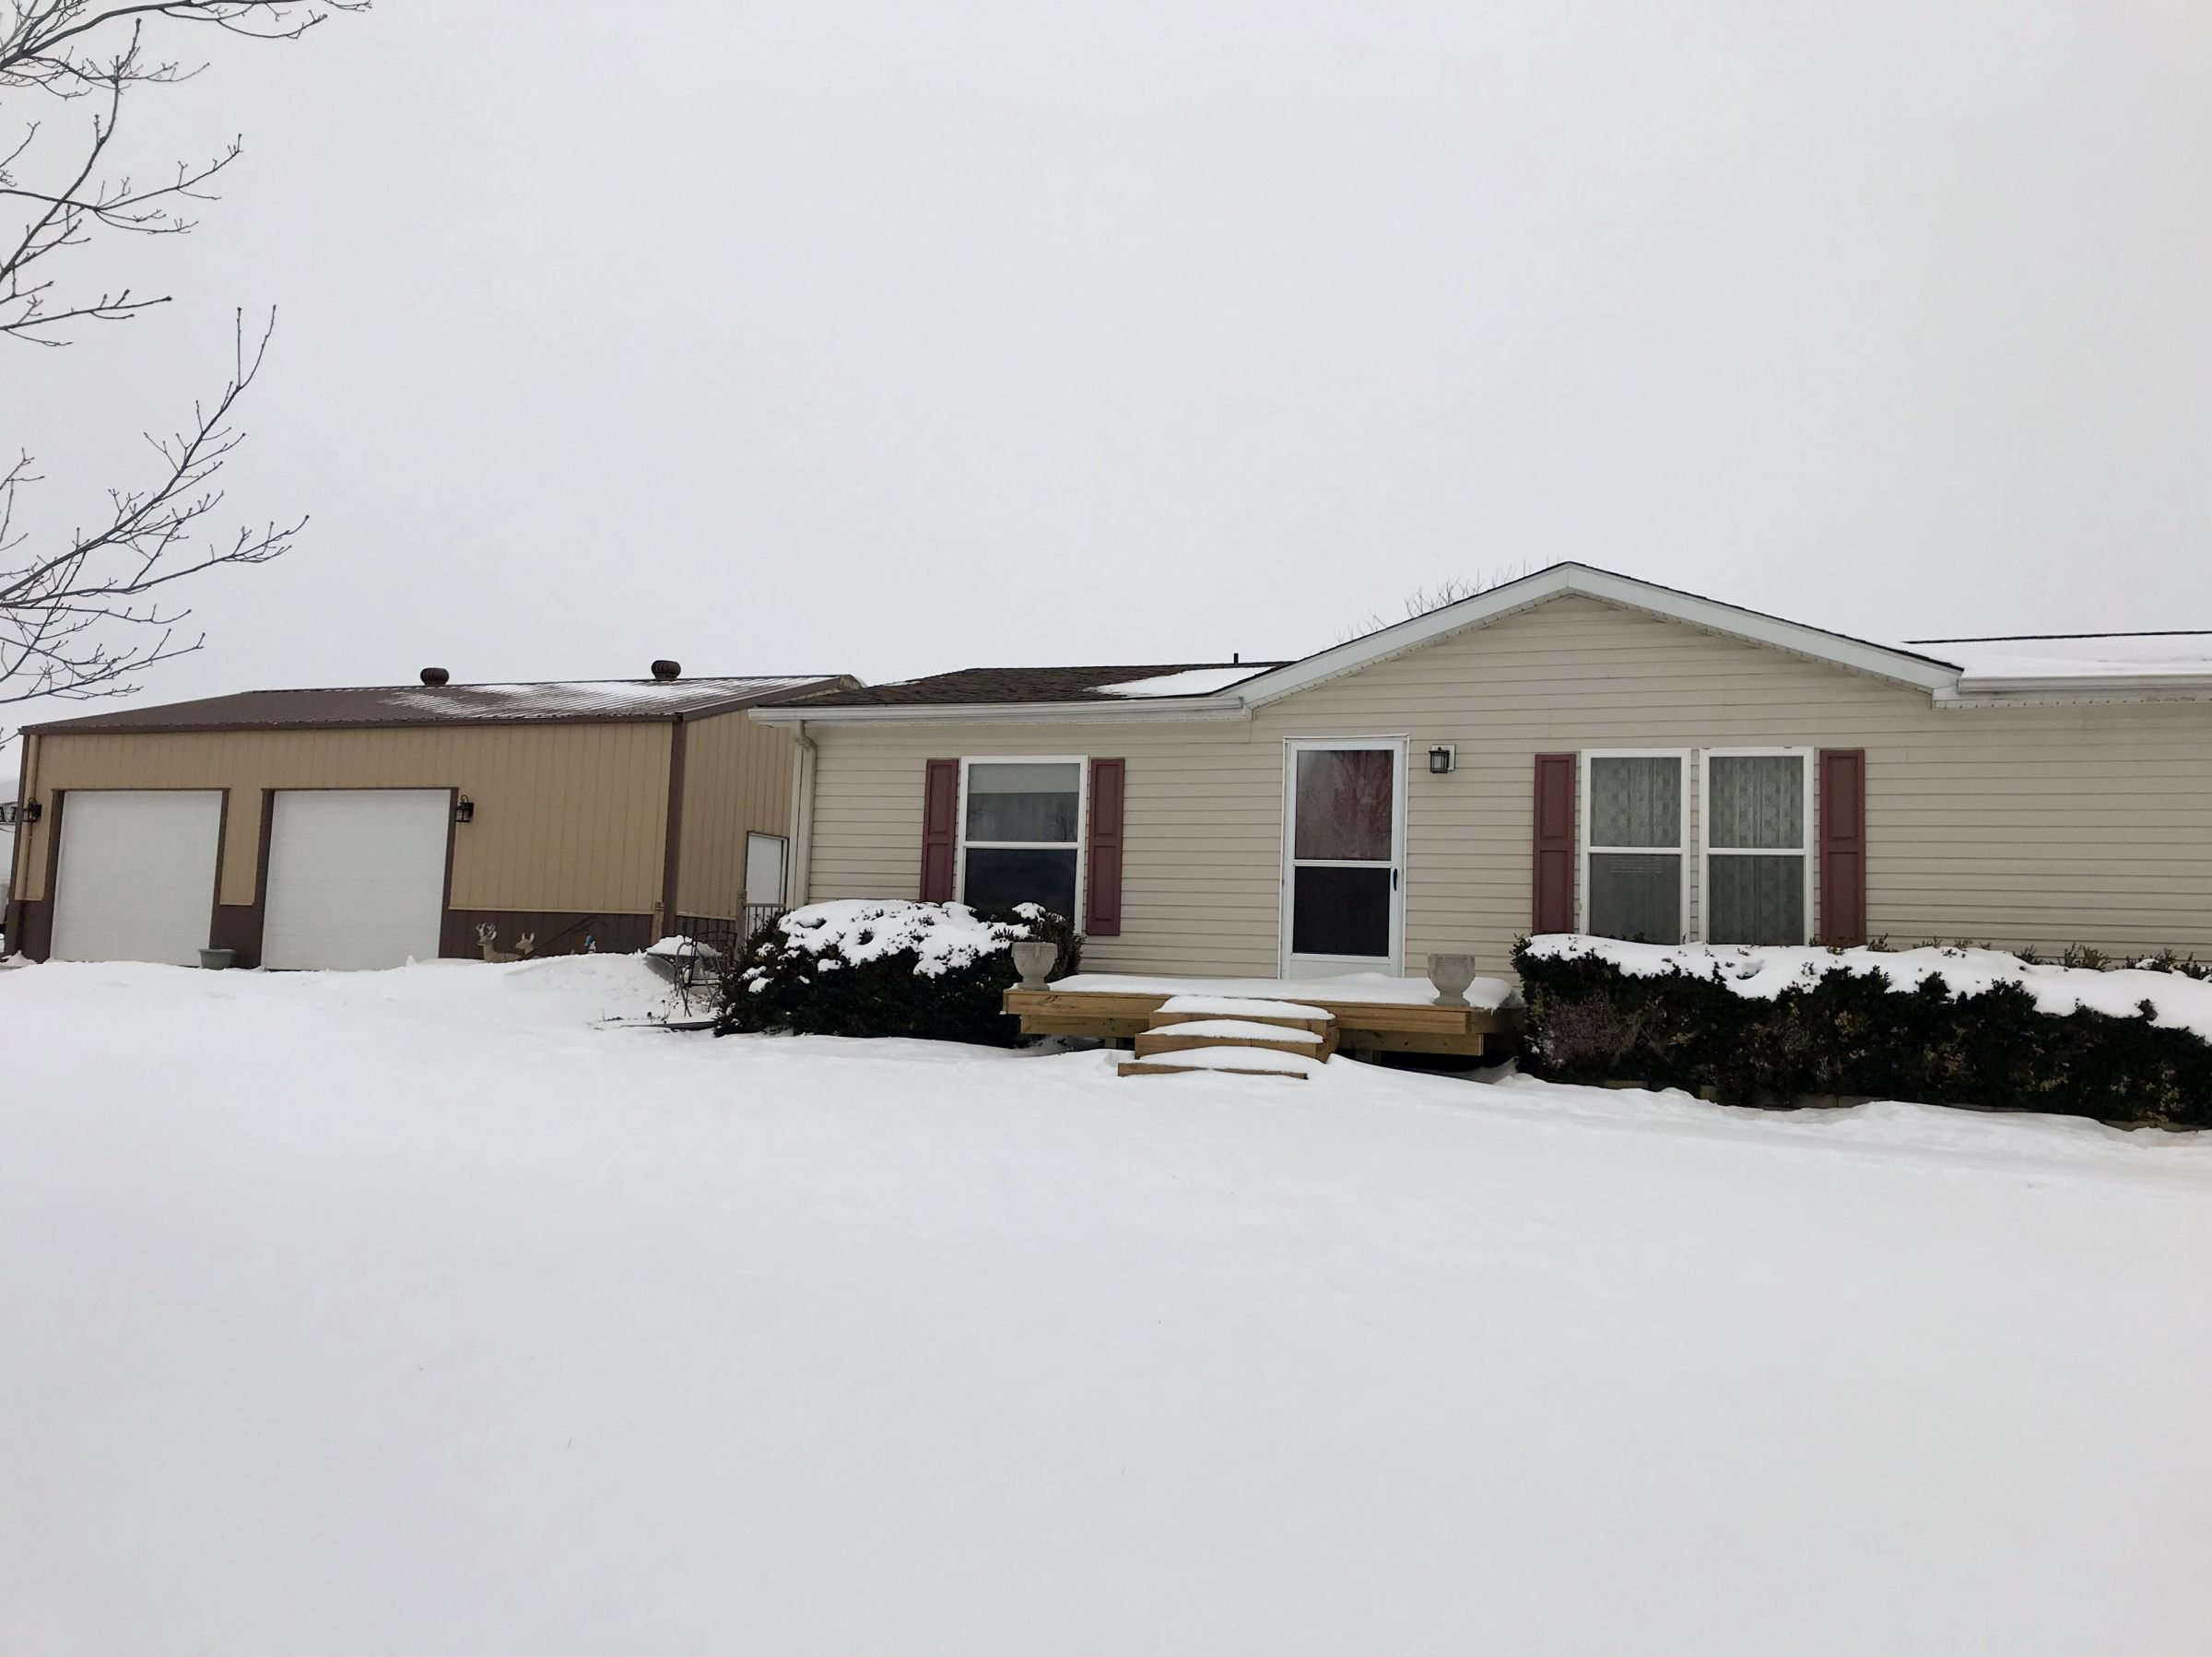 residential-warren-county-iowa-7-acres-listing-number-15327-3-2021-02-17-135107.JPG